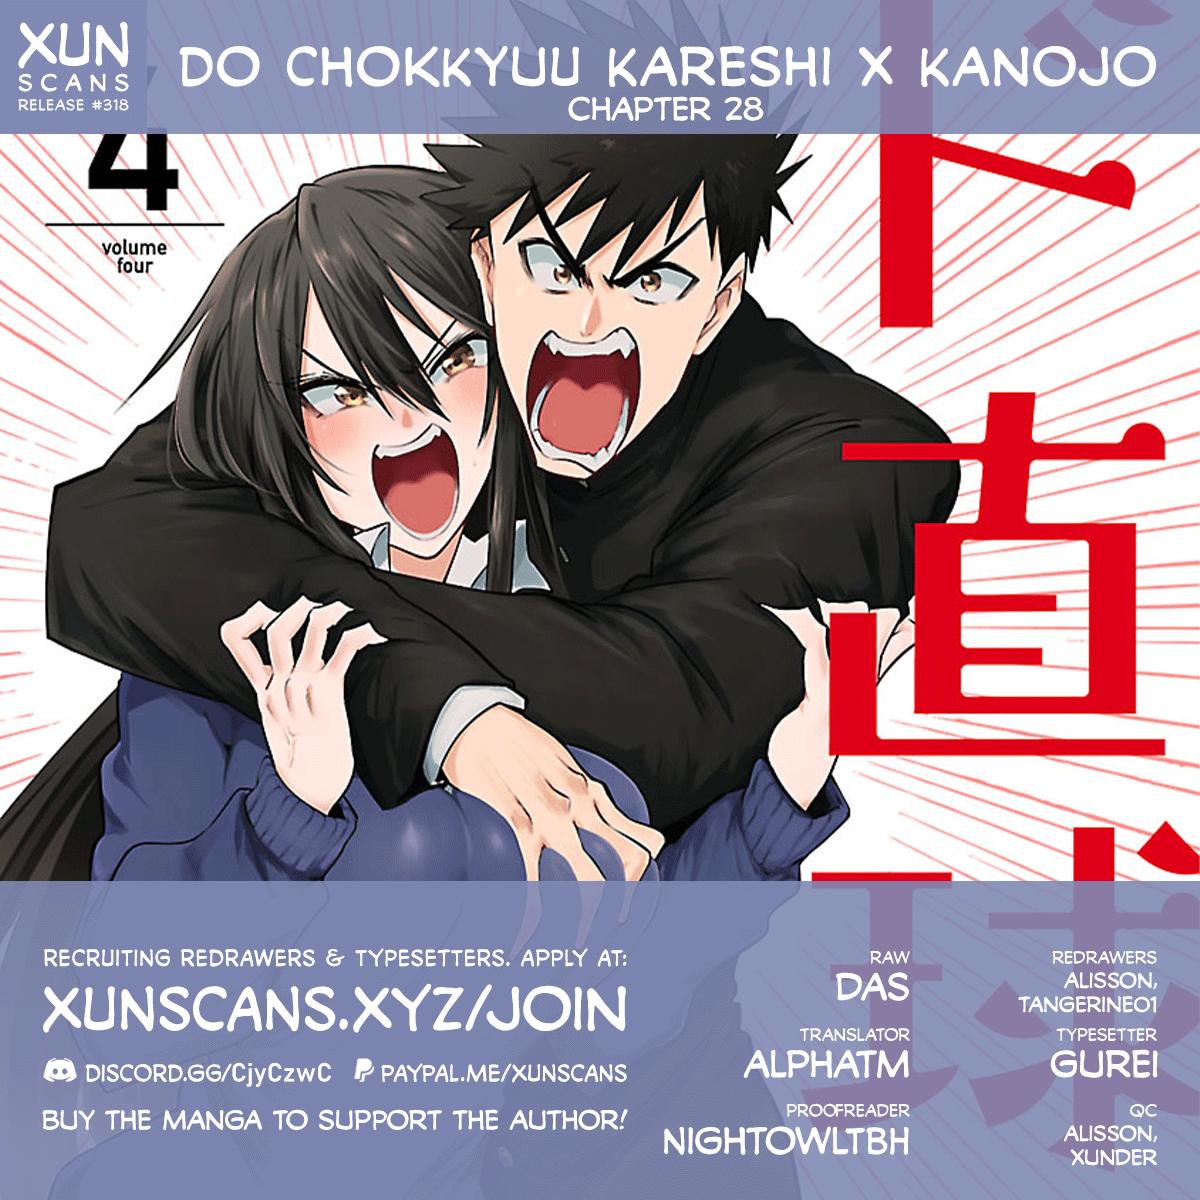 Manga Do Chokkyuu Kareshi x Kanojo - Chapter 28 Page 1